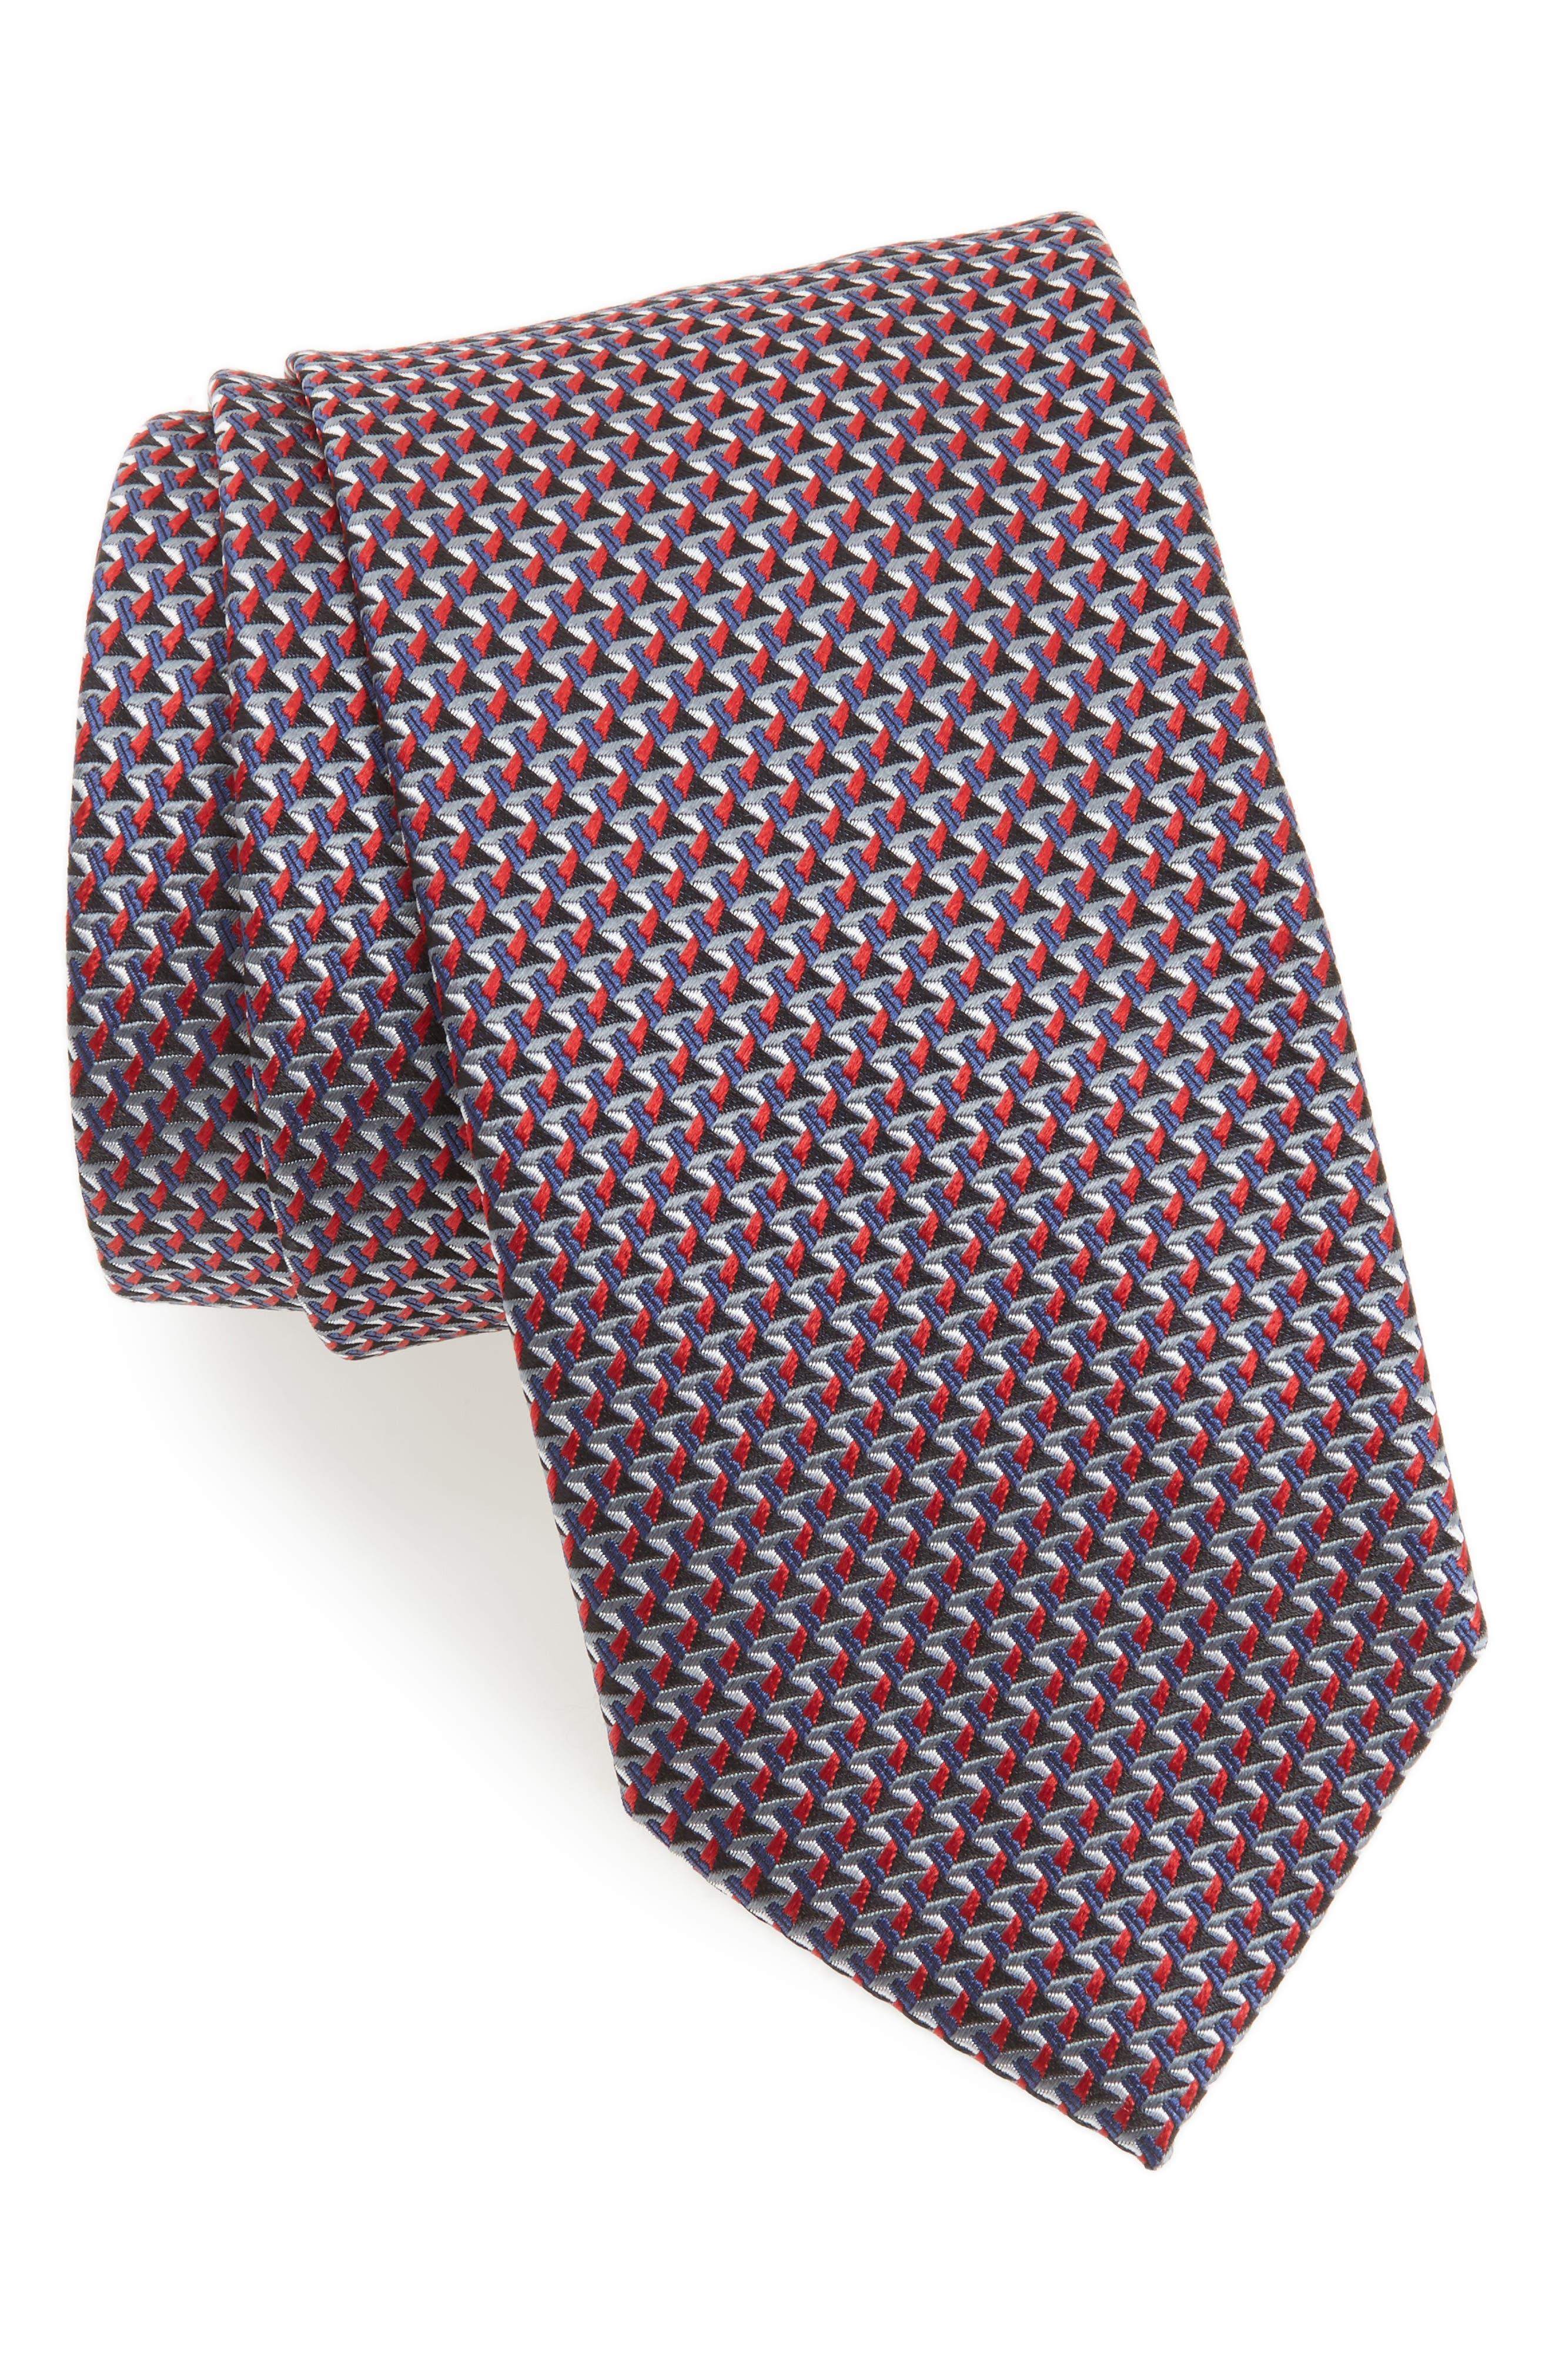 Alternate Image 1 Selected - Brioni Geometric Silk Tie